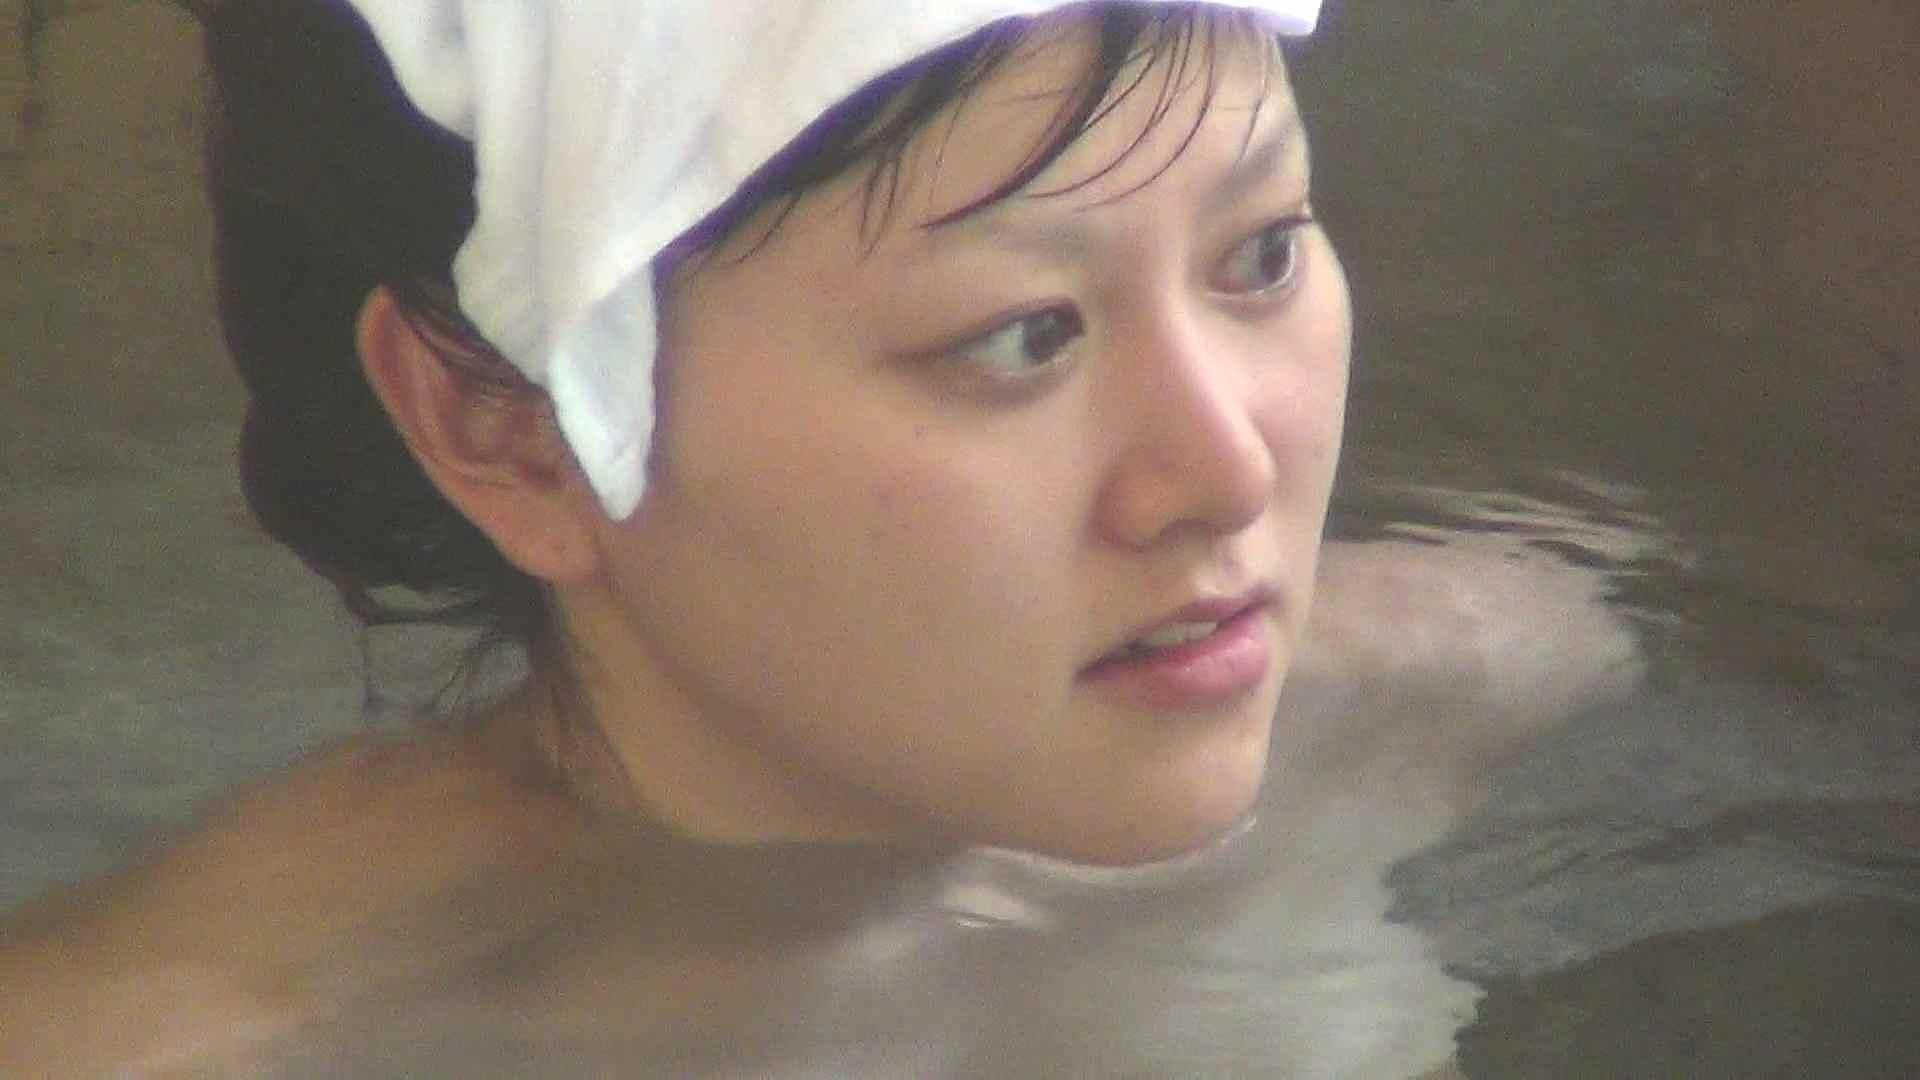 Aquaな露天風呂Vol.302 露天風呂突入 ヌード画像 82pic 62